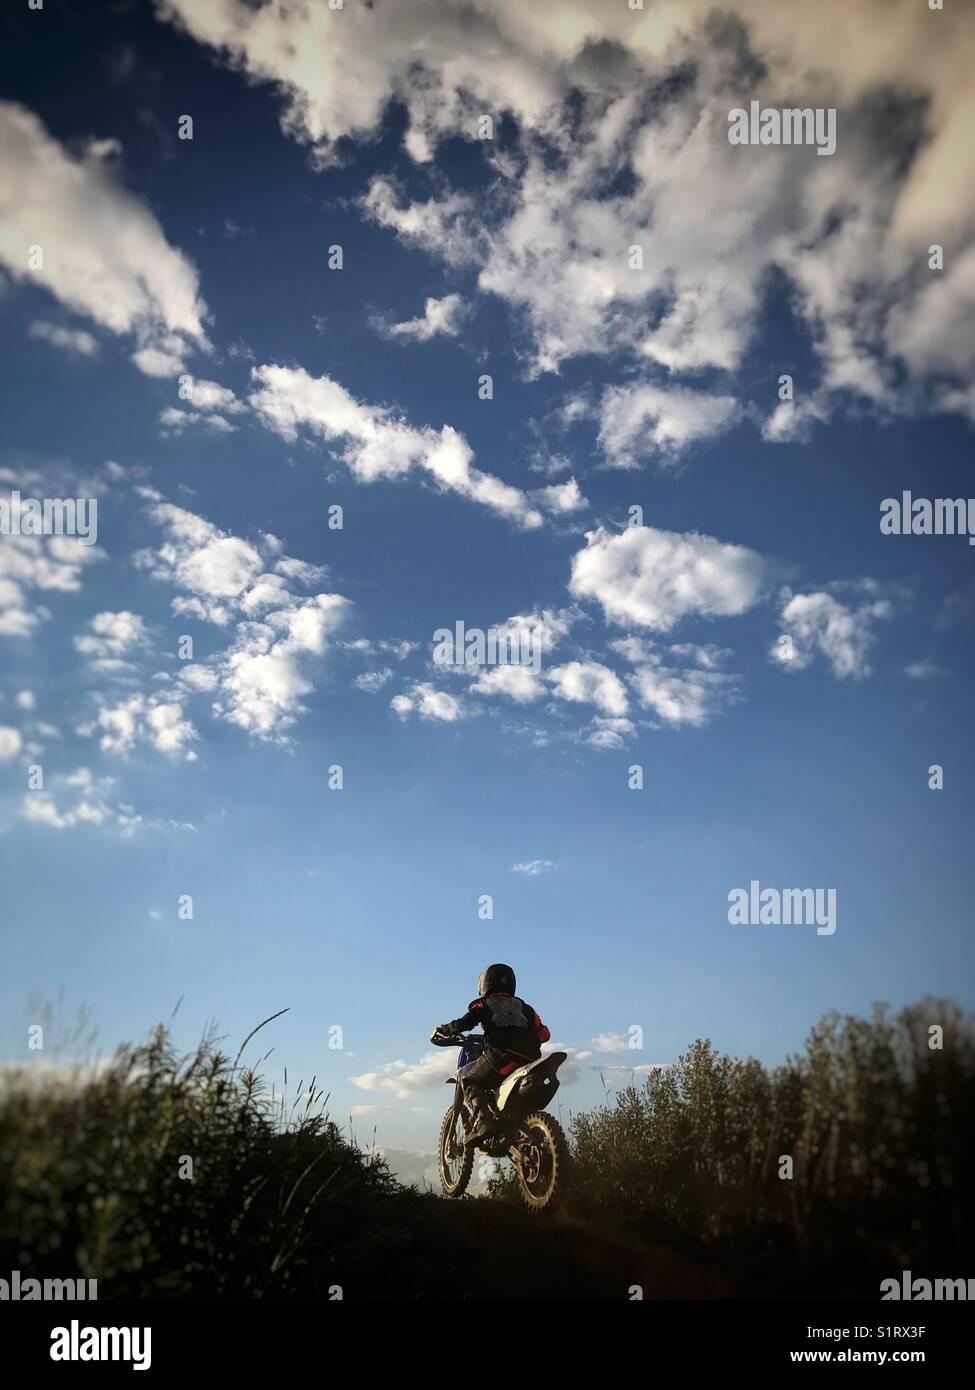 Boy riding a dirt bike - Stock Image